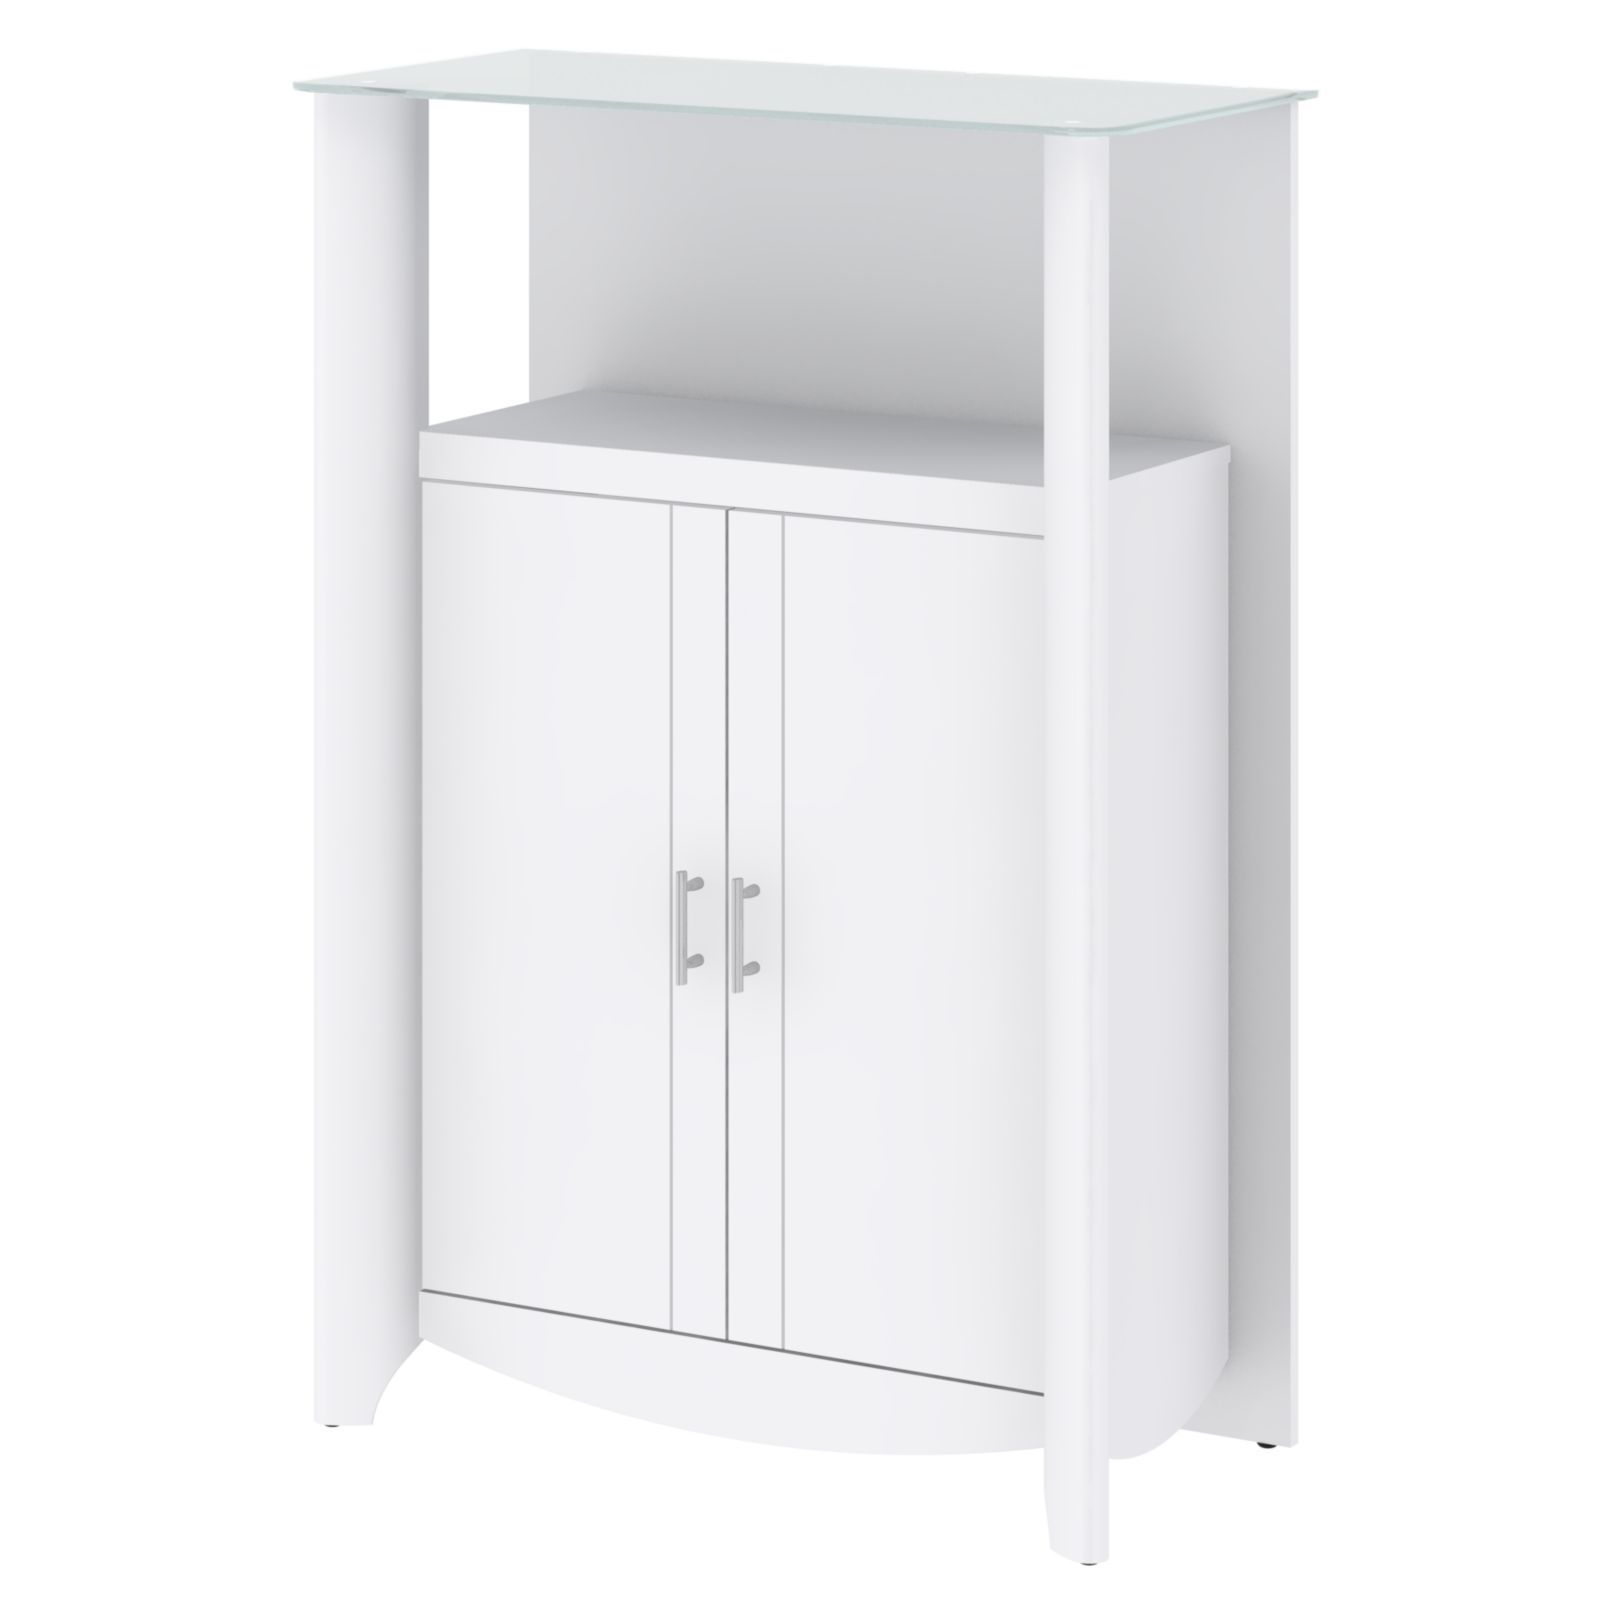 Bush Furniture 'Aero' Top 2-door Curio Bookcase